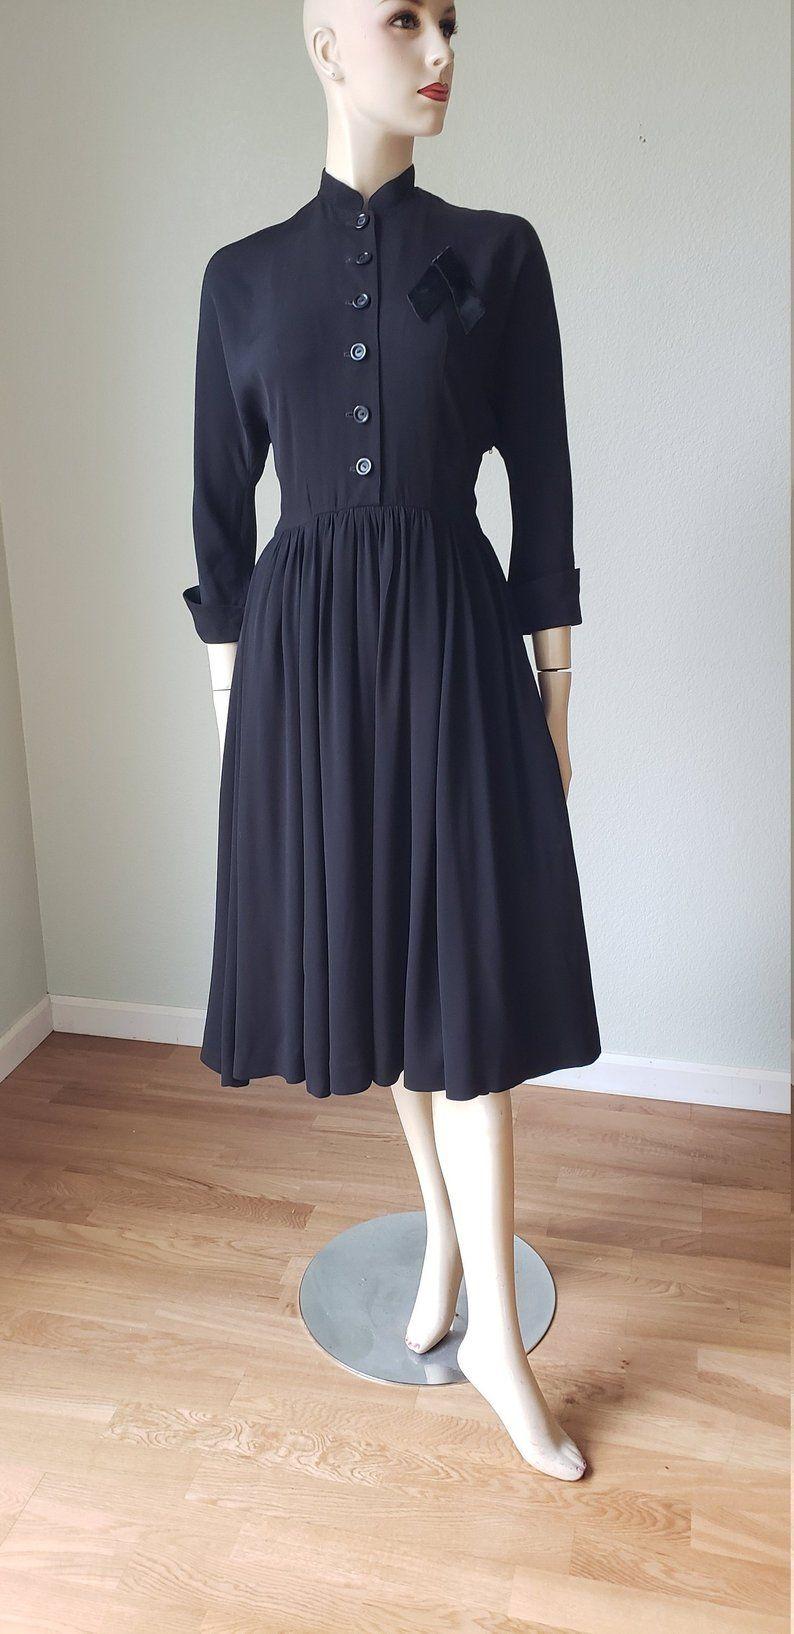 Late 40s Little Black Dress 40s Rayon Dress 1940s Dress Etsy Rayon Dress 1940s Dresses Dresses [ 1634 x 794 Pixel ]